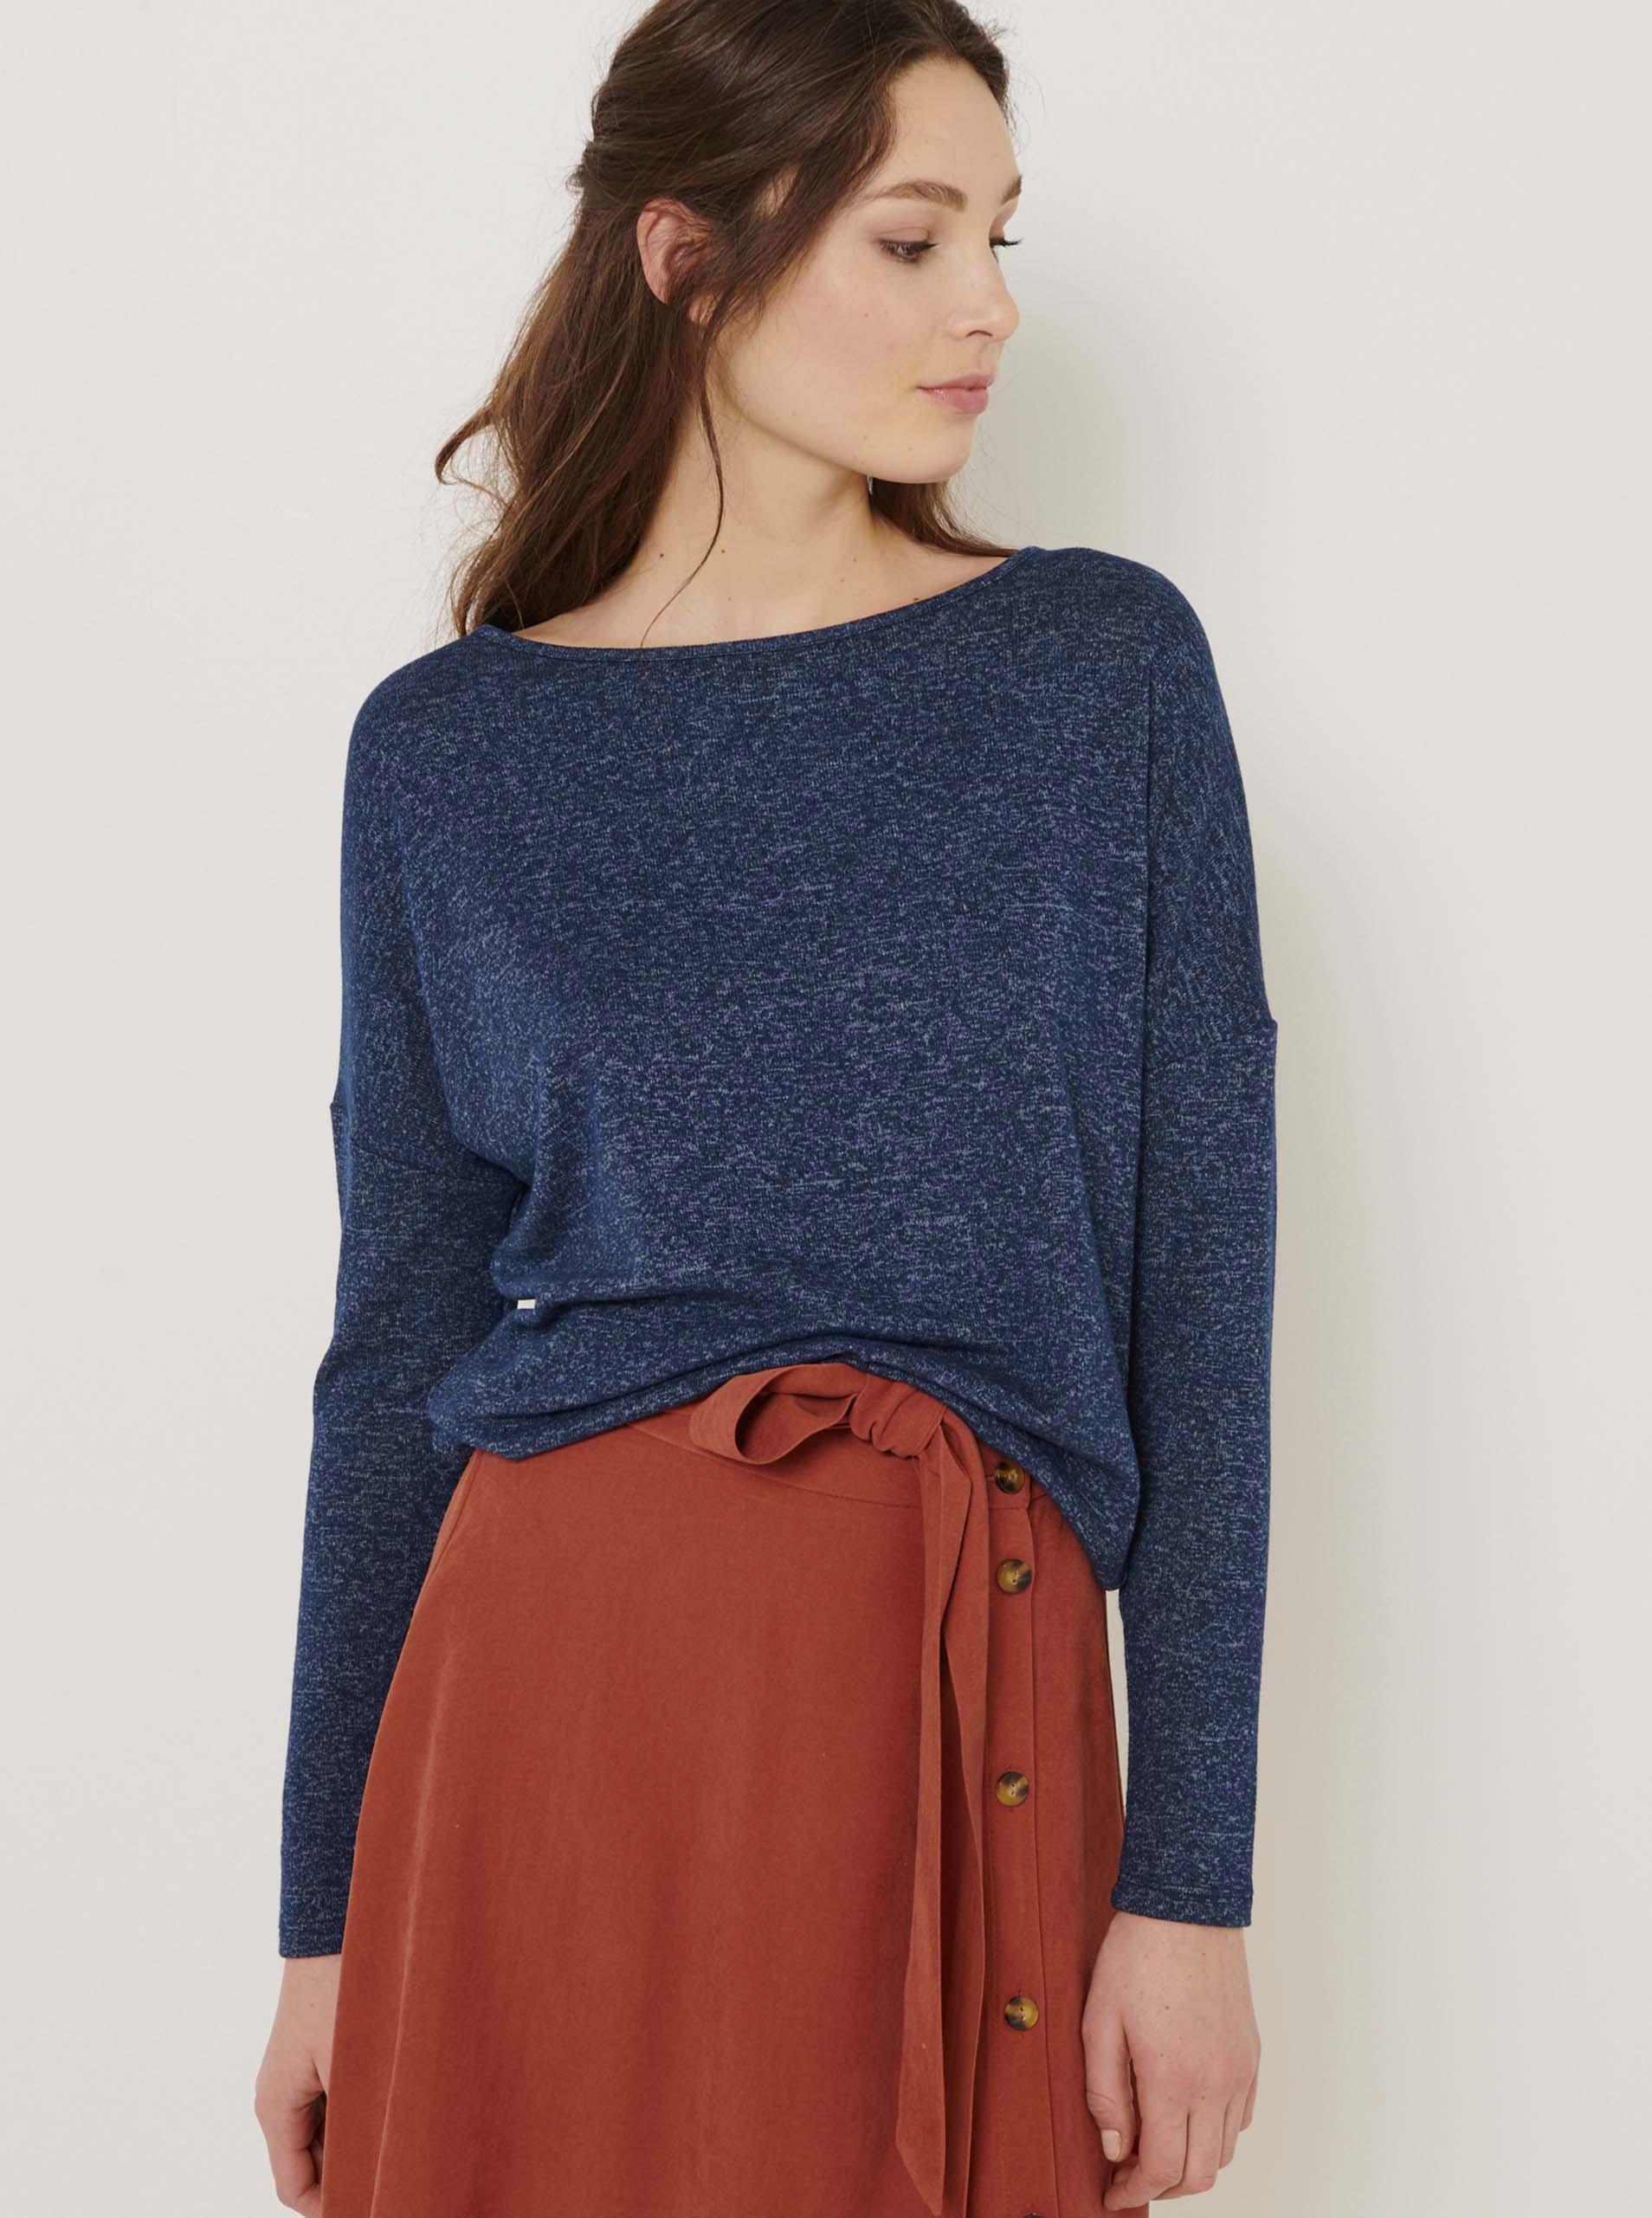 CAMAIEU niebieski damska koszulka